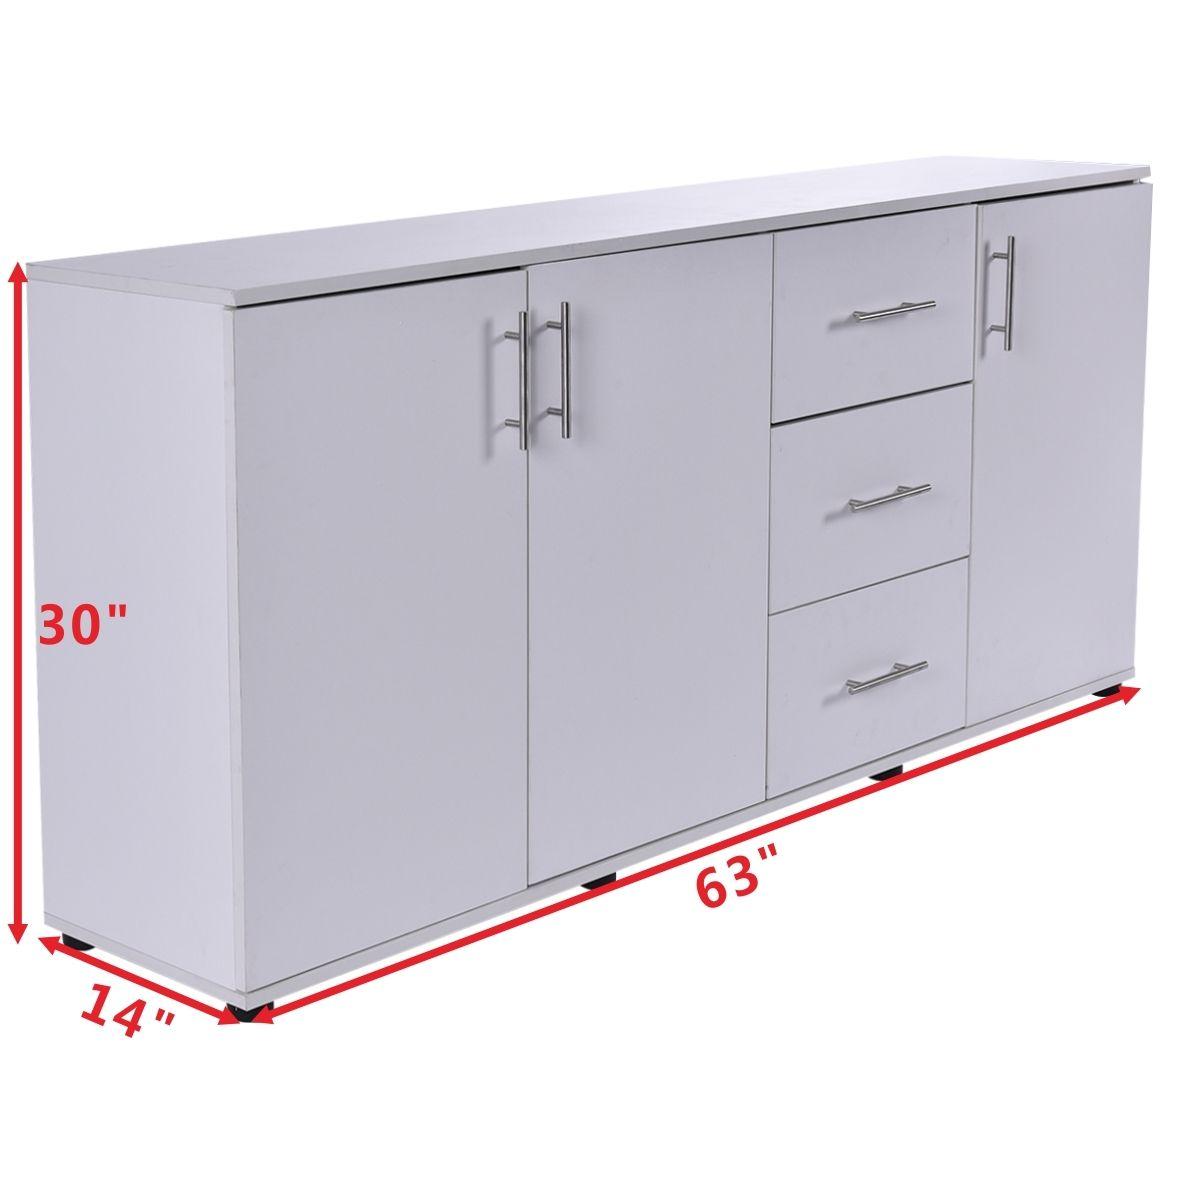 Costway Three Doors Storage Cabinet Cupboard Organizer Shelves Pantry Kitchen Furniture